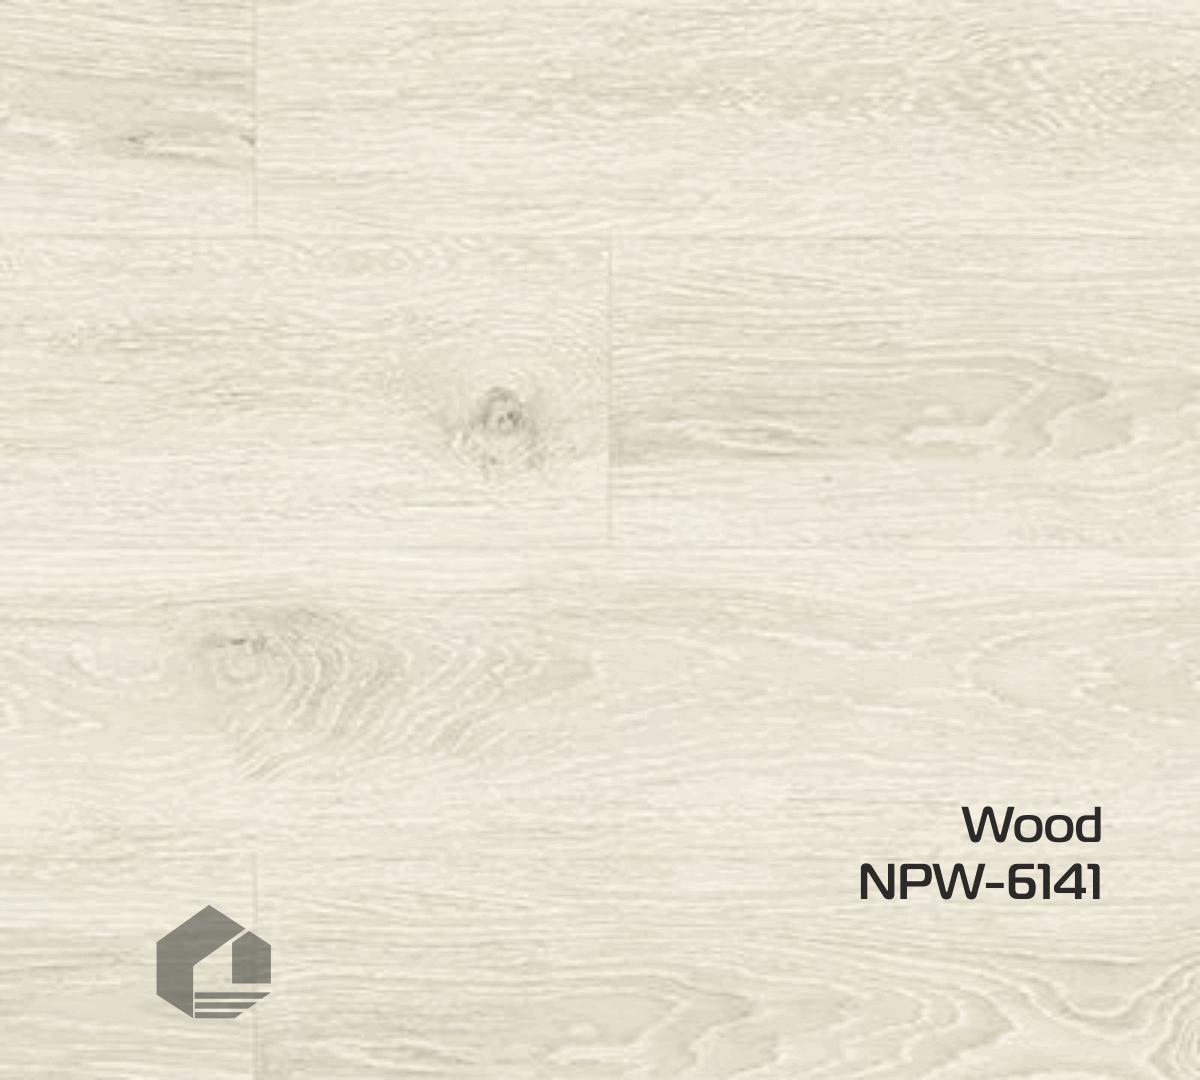 Кварцвиниловая плитка Orchid Tile Wood NPW-6141 (186*940*3 мм.) 19шт/3,32м2